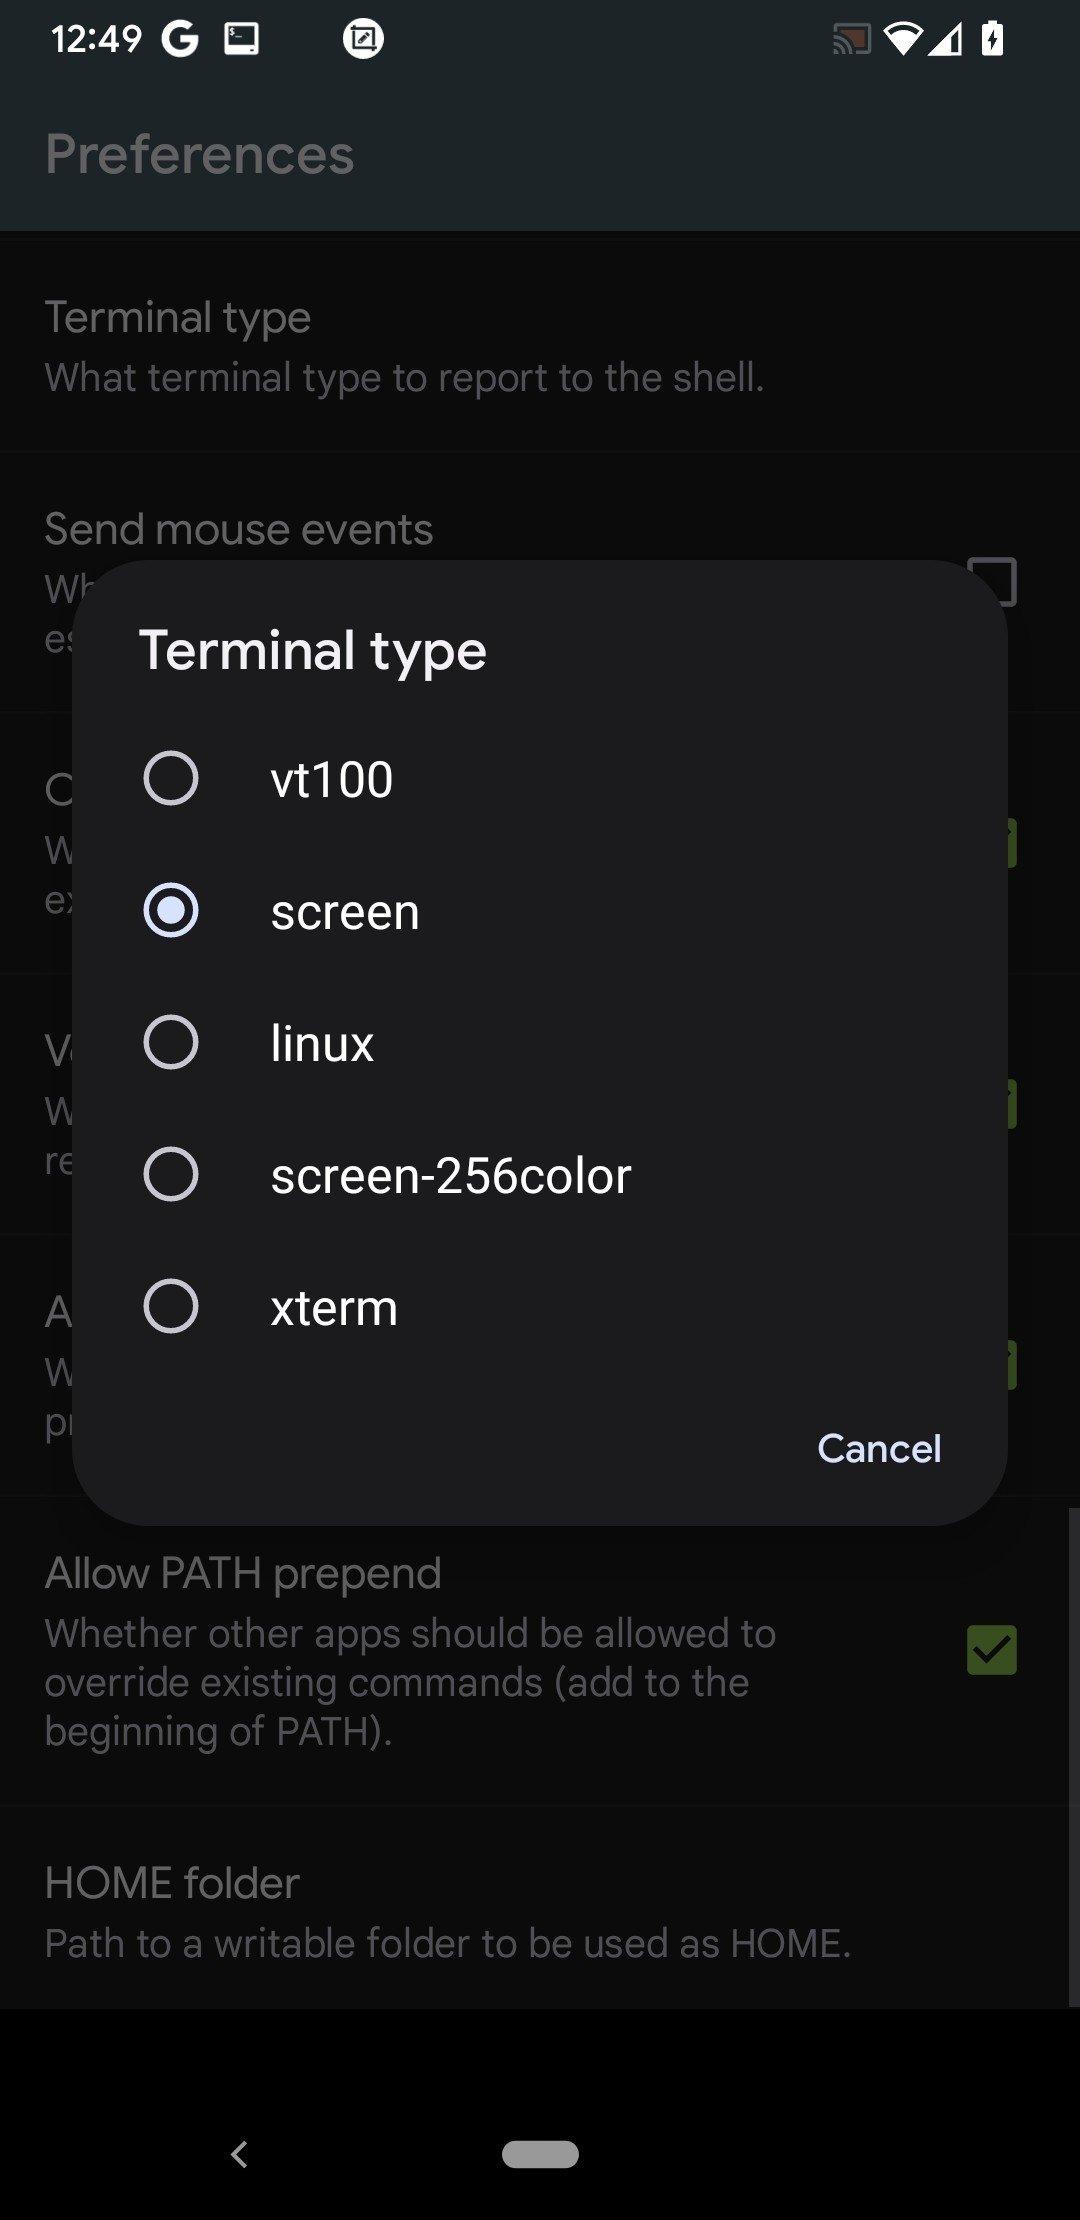 Download Android Terminal Emulator 1 0 70 Apk Free